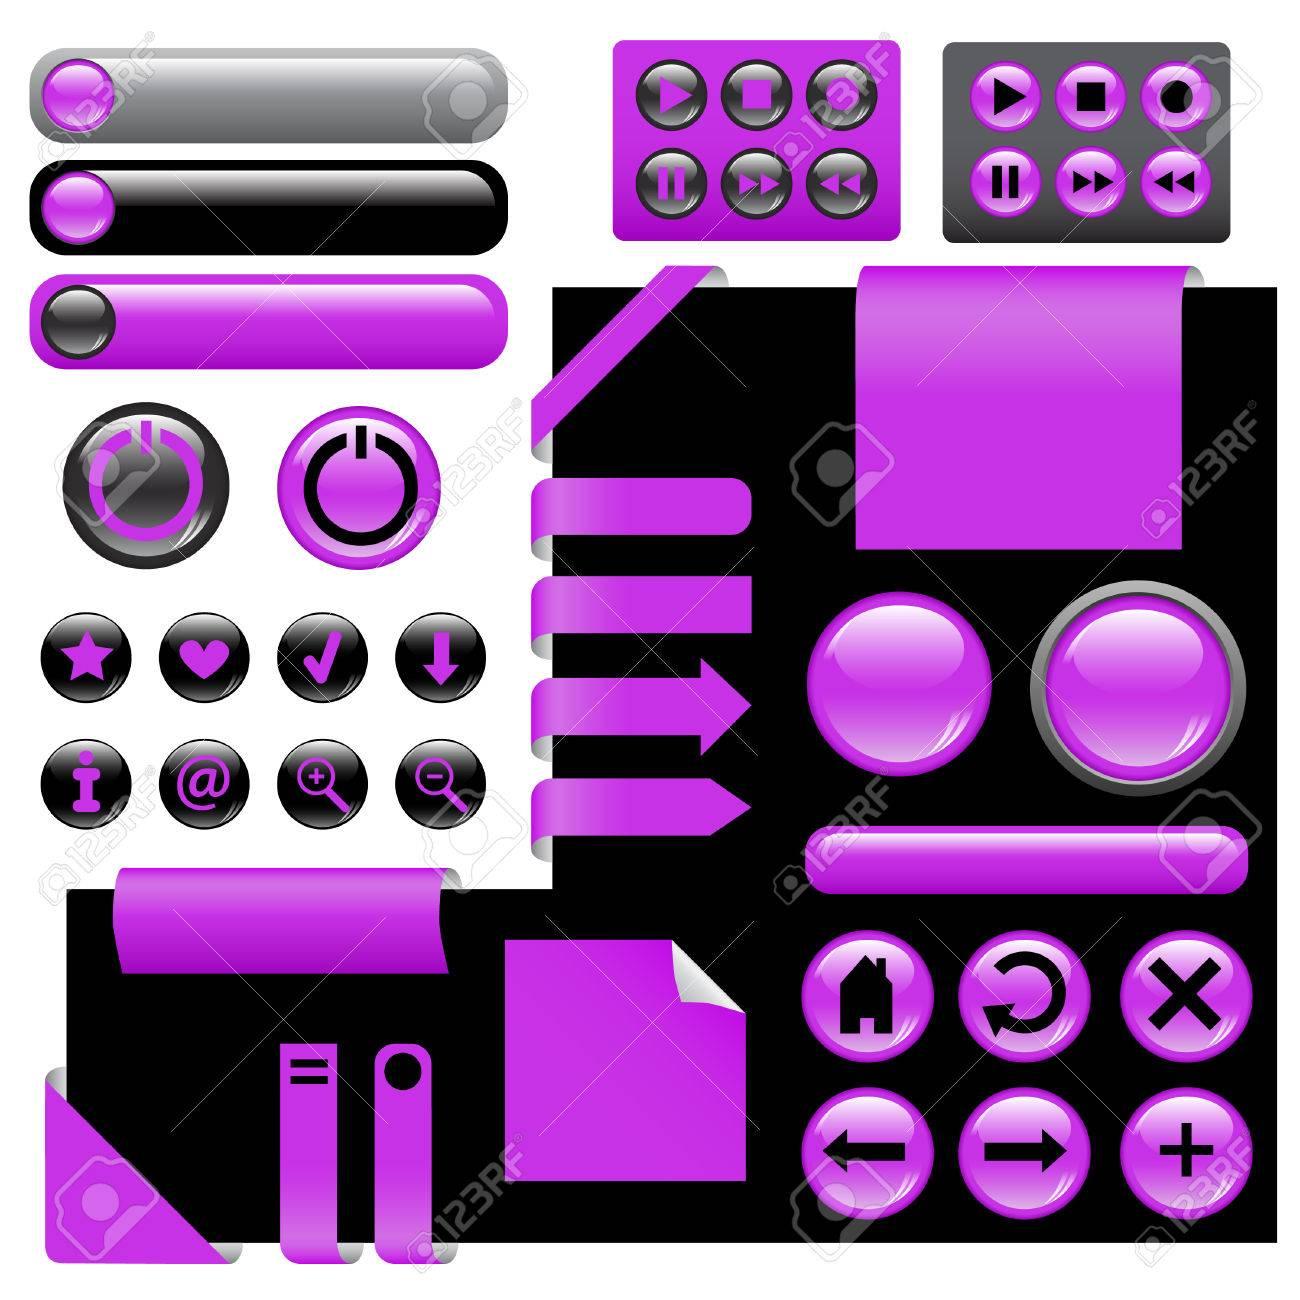 website design elements - buttons in violet color Stock Vector - 8978196